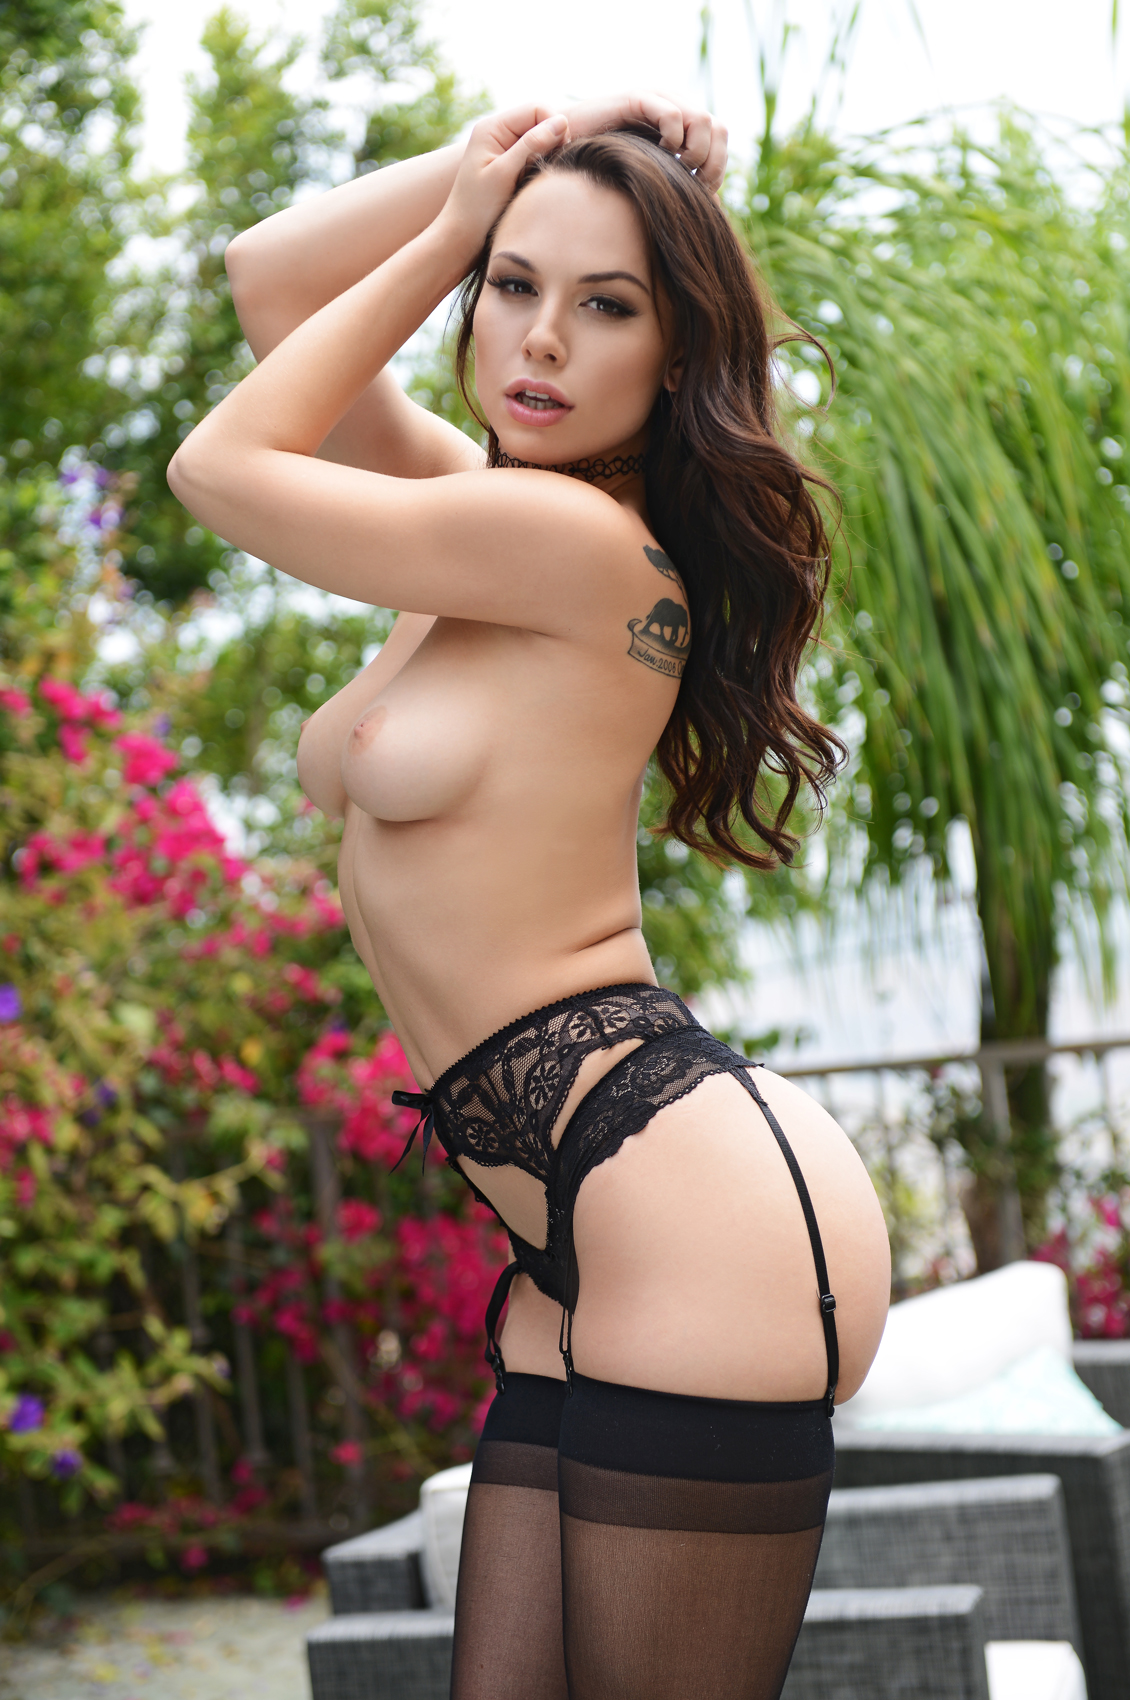 Aidra Fox's VR Porn Videos, Bio & Free Nude Pics